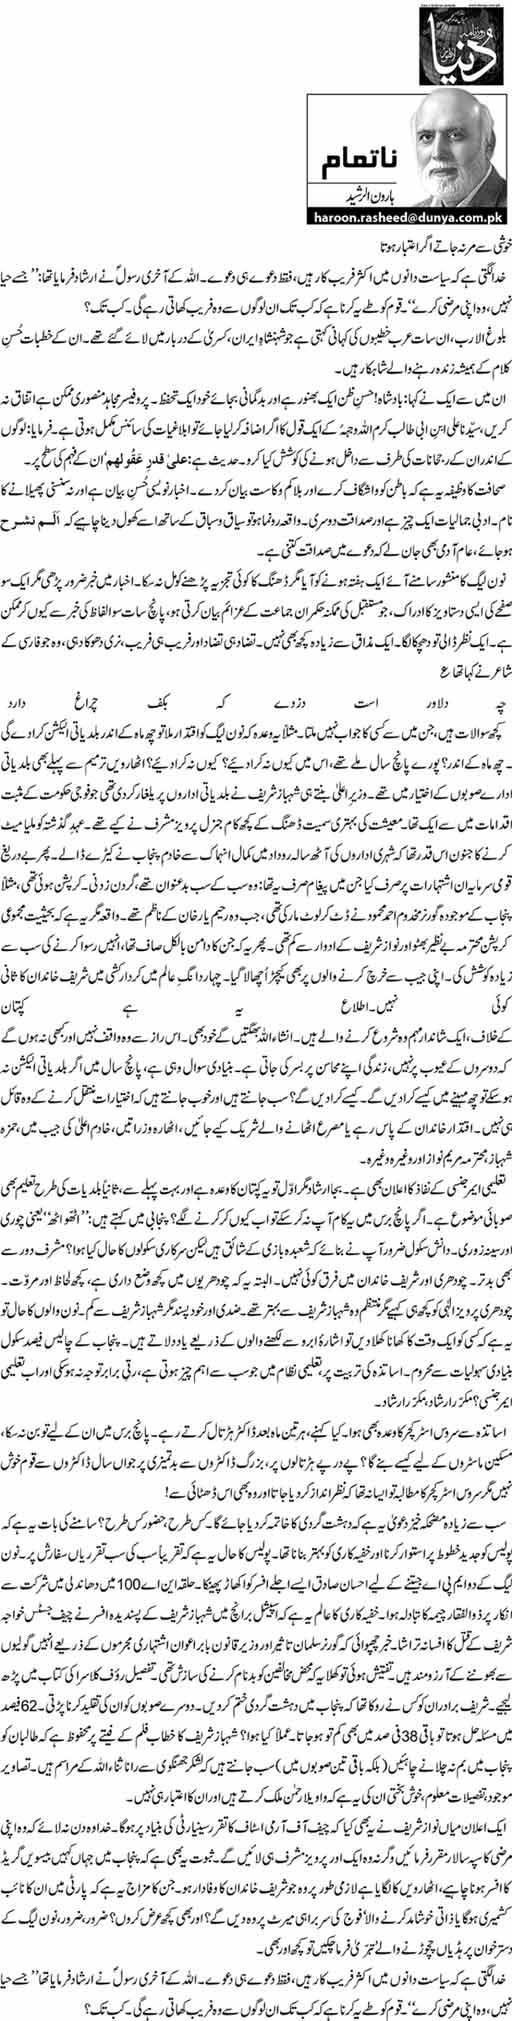 Khushi se mar na jatay agar aitebaar hota - Haroon-ur-Rahseed